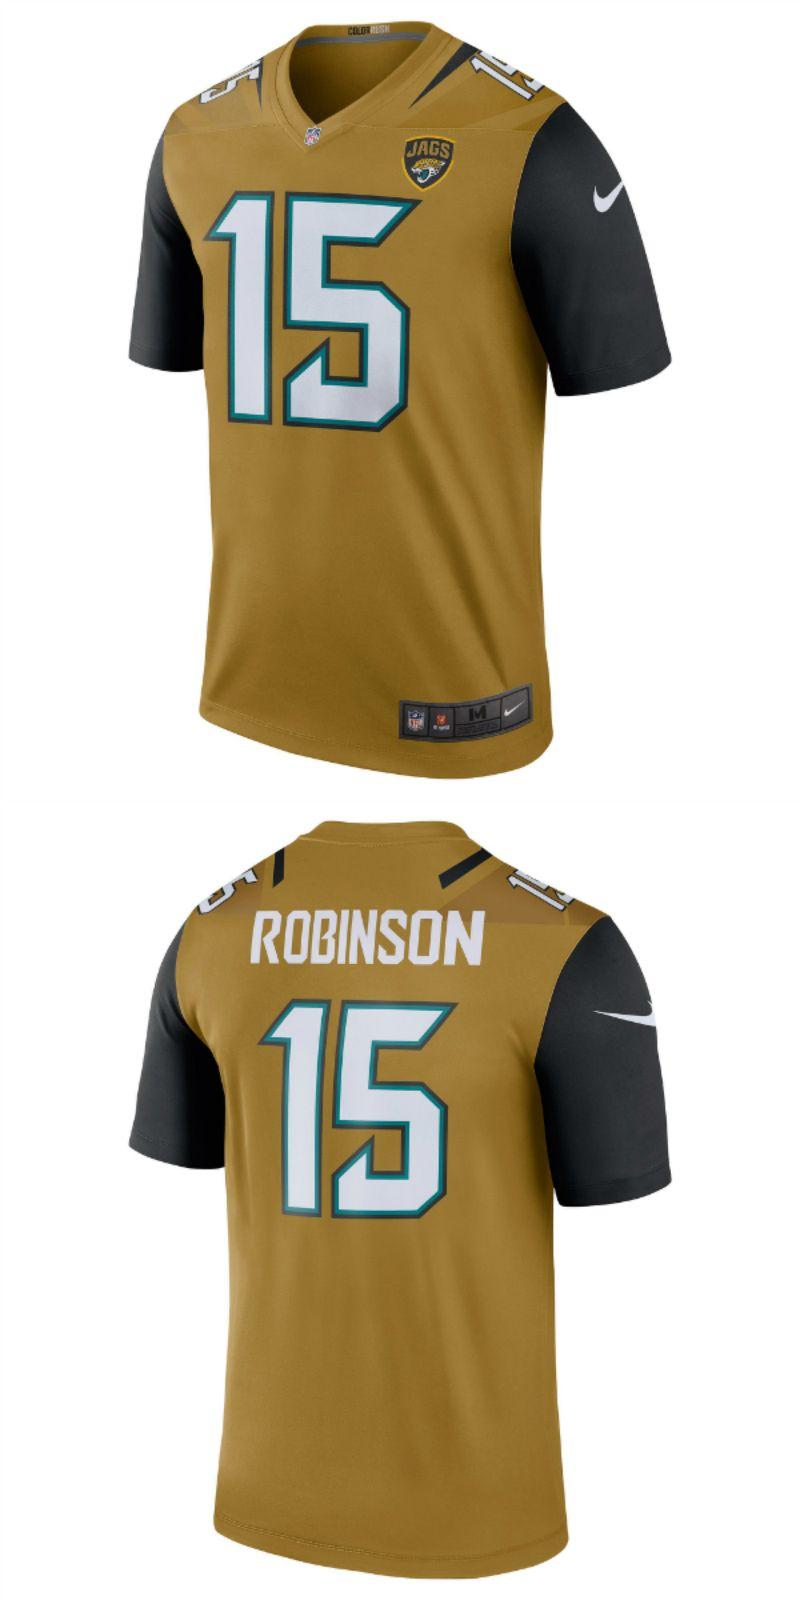 e1eb1375 UP TO 70% OFF. Allen Robinson Jacksonville Jaguars Nike Color Rush ...